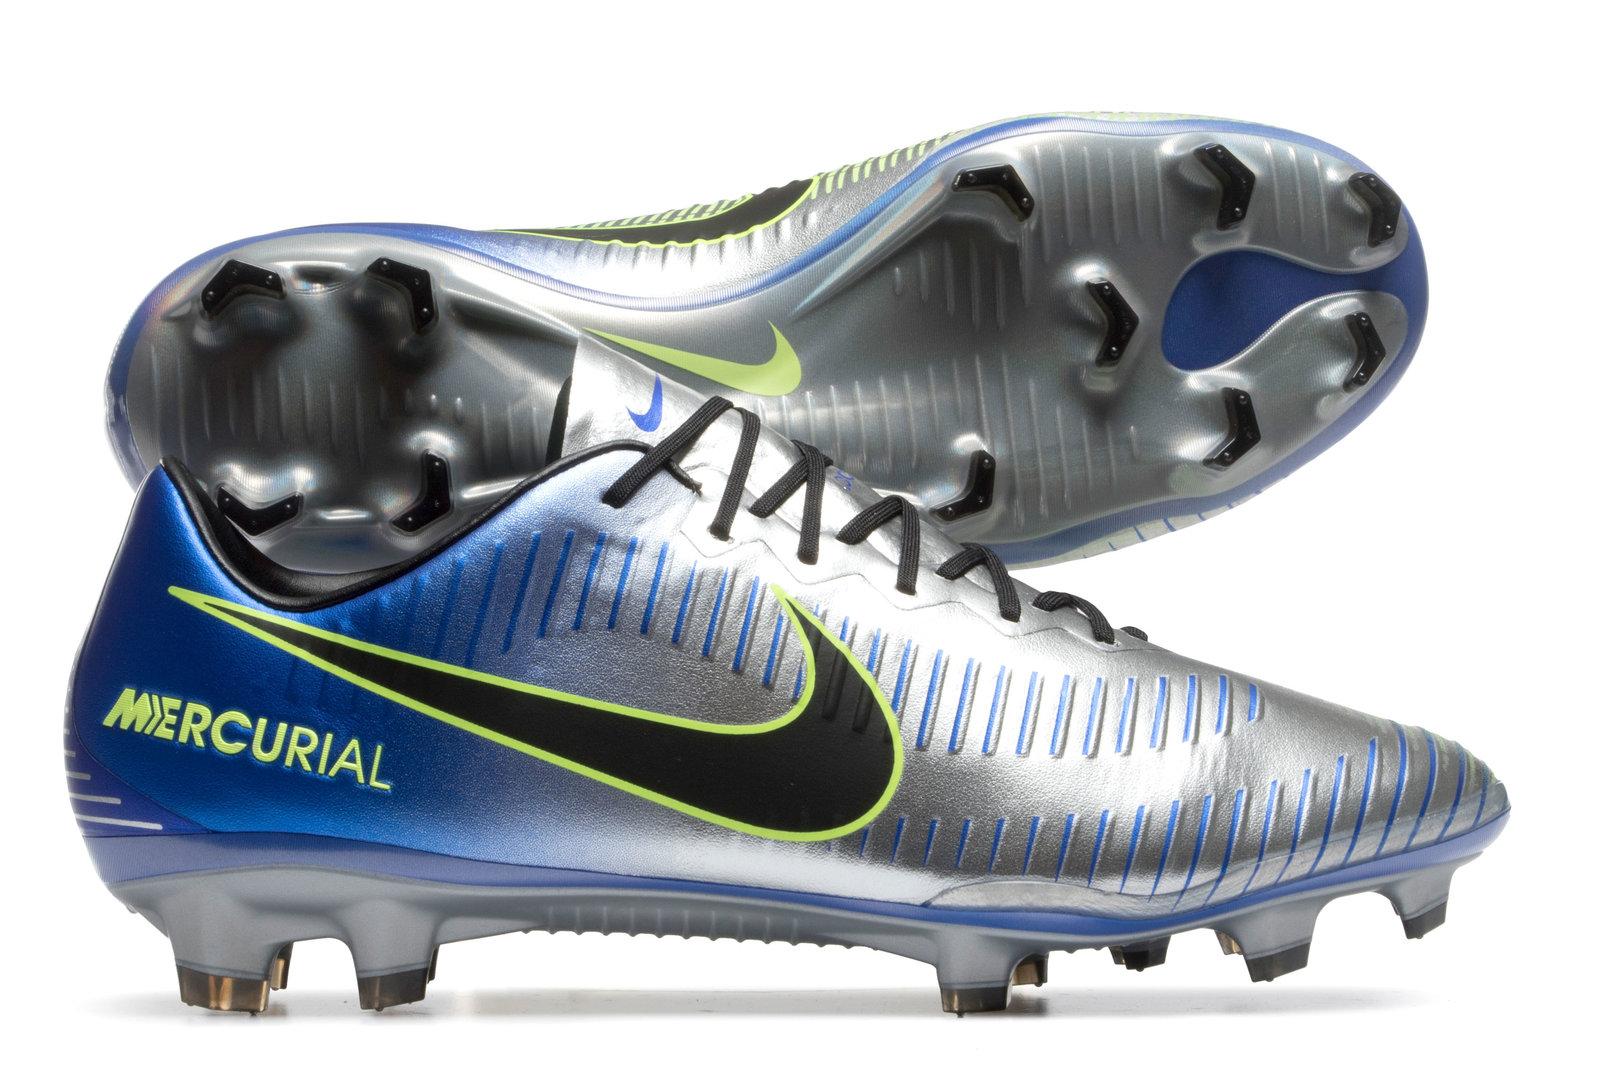 Image of Mercurial Vapor XI Neymar FG Football Boots